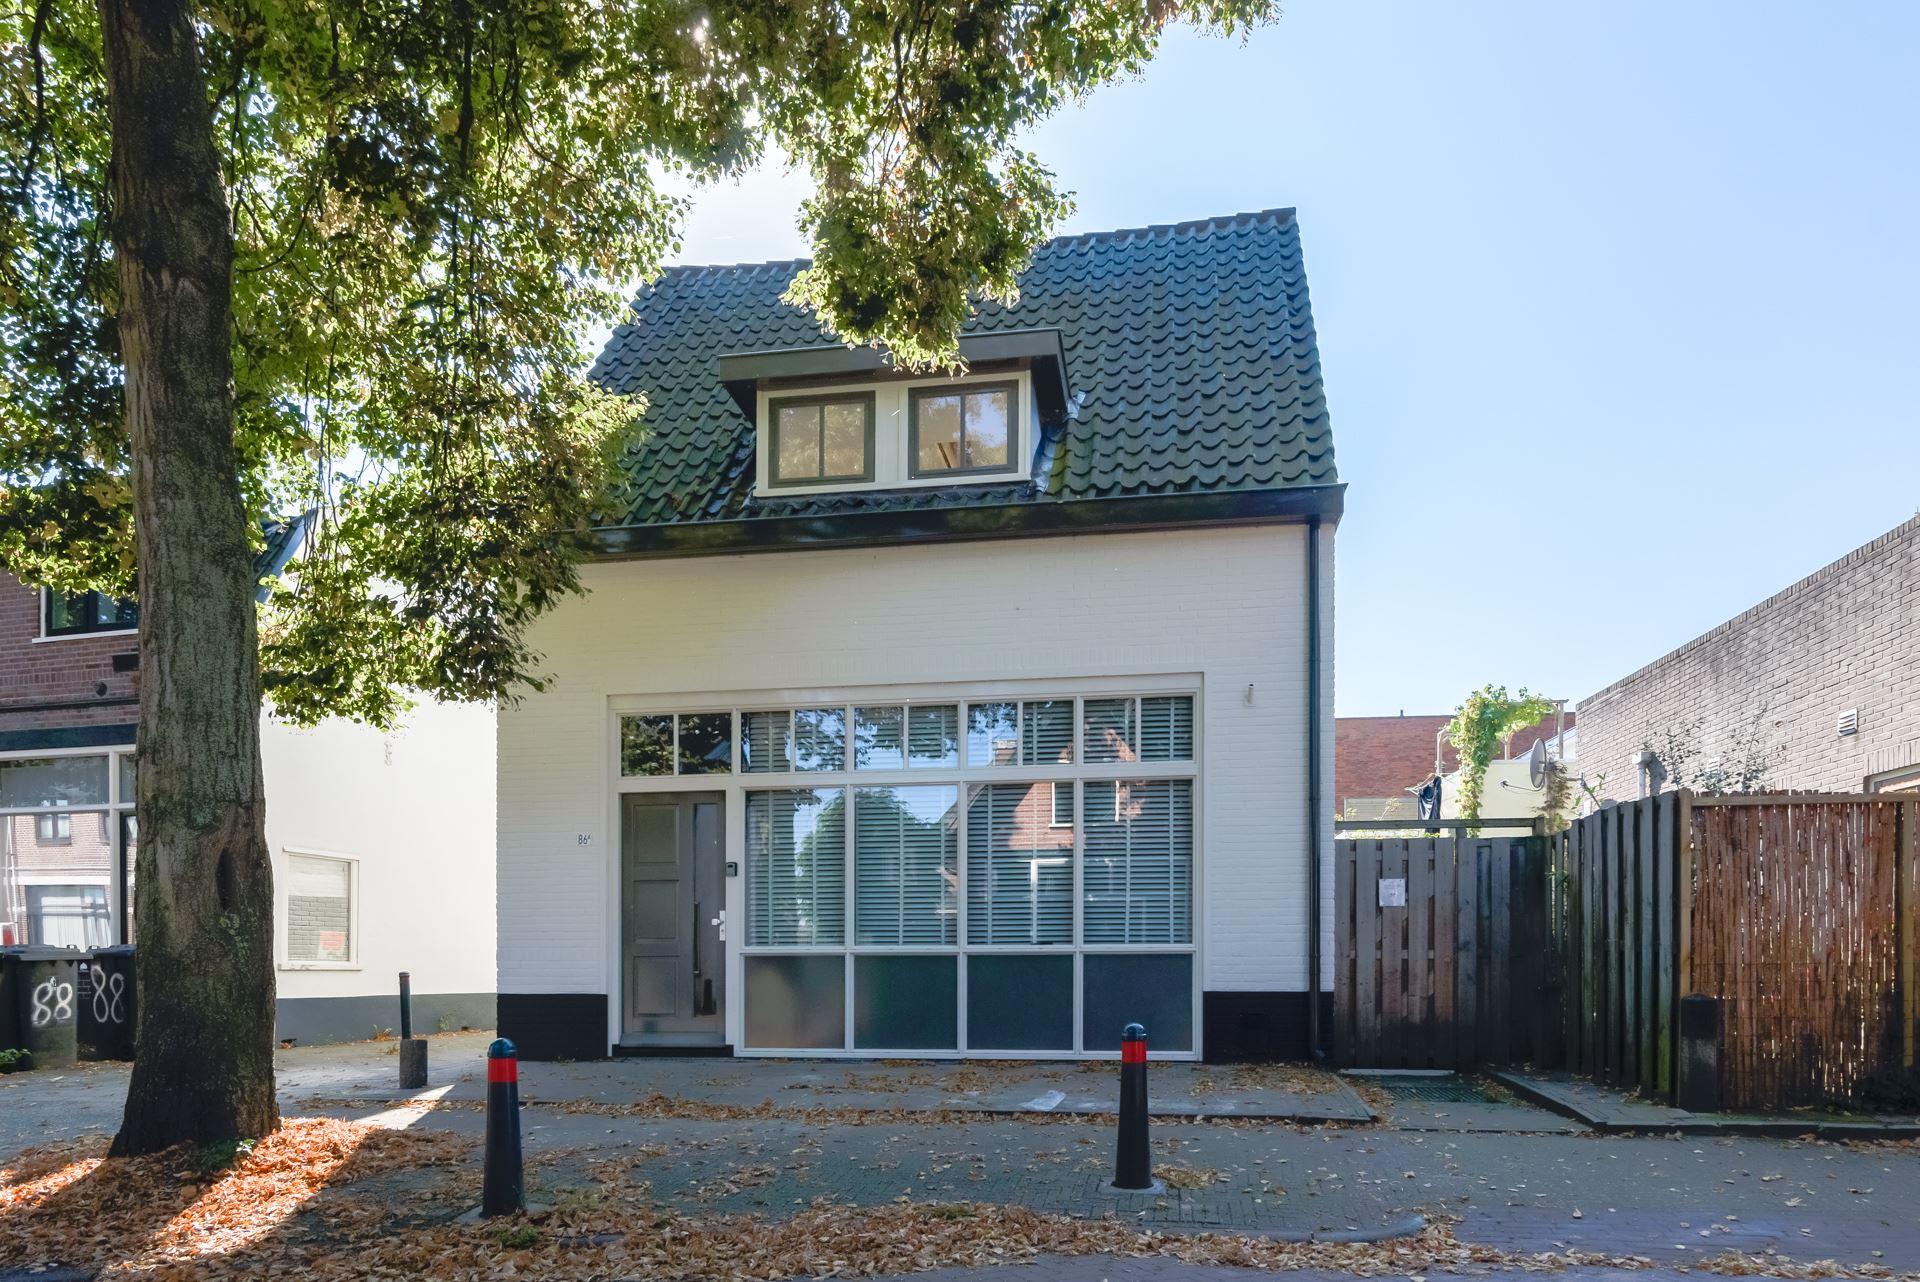 Huygenstraat, Hilversum